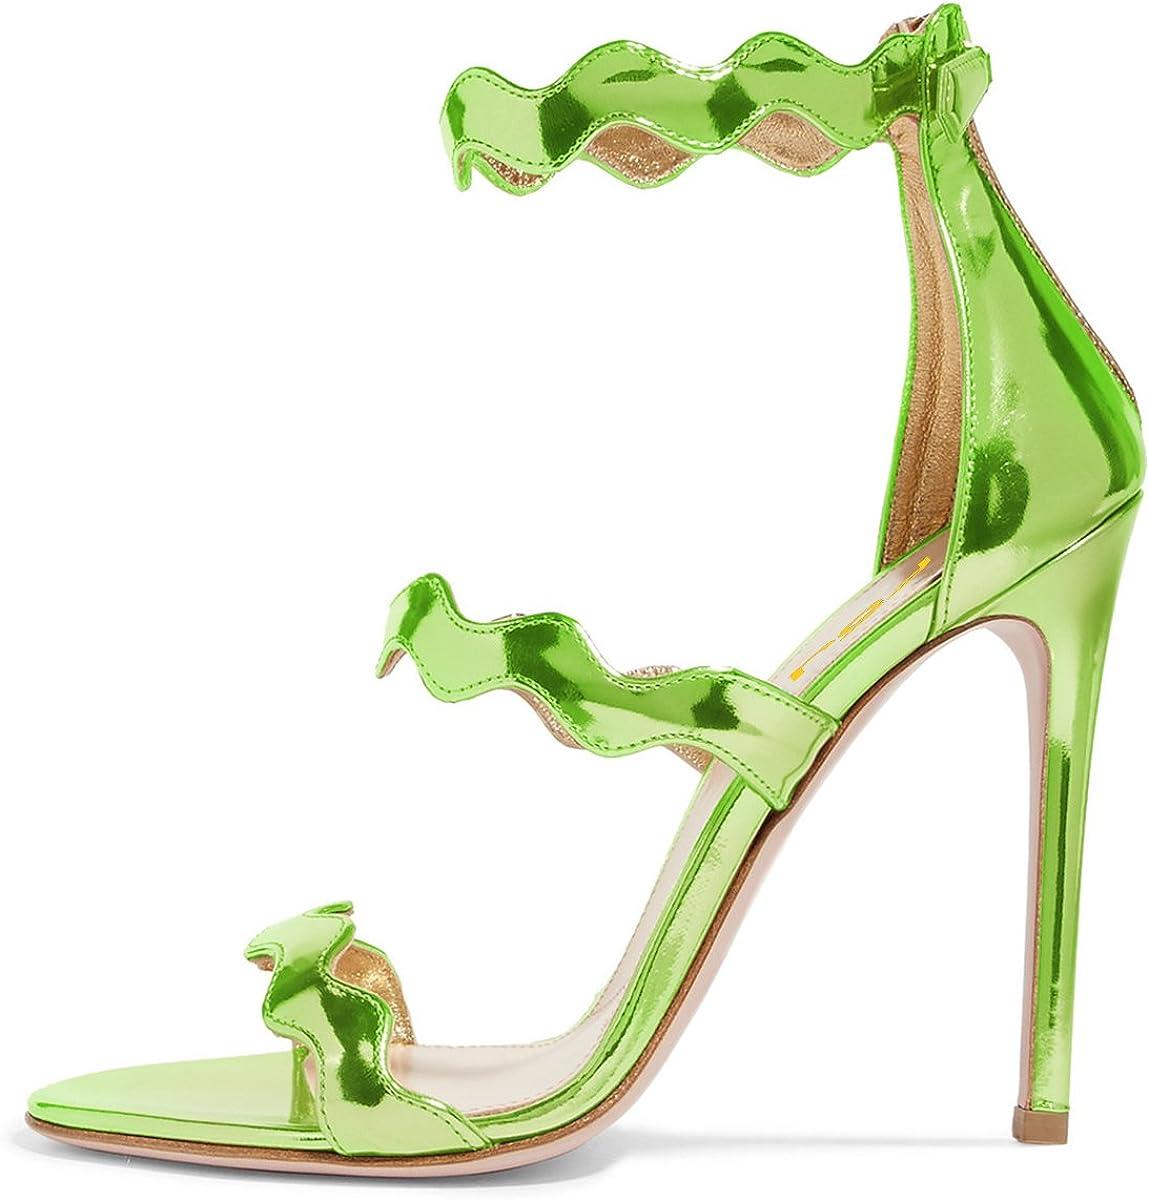 FSJ Women Hot Open Toe Strappy Heeled Sandals Suede Dress Shoe for Party Size 4-15 US